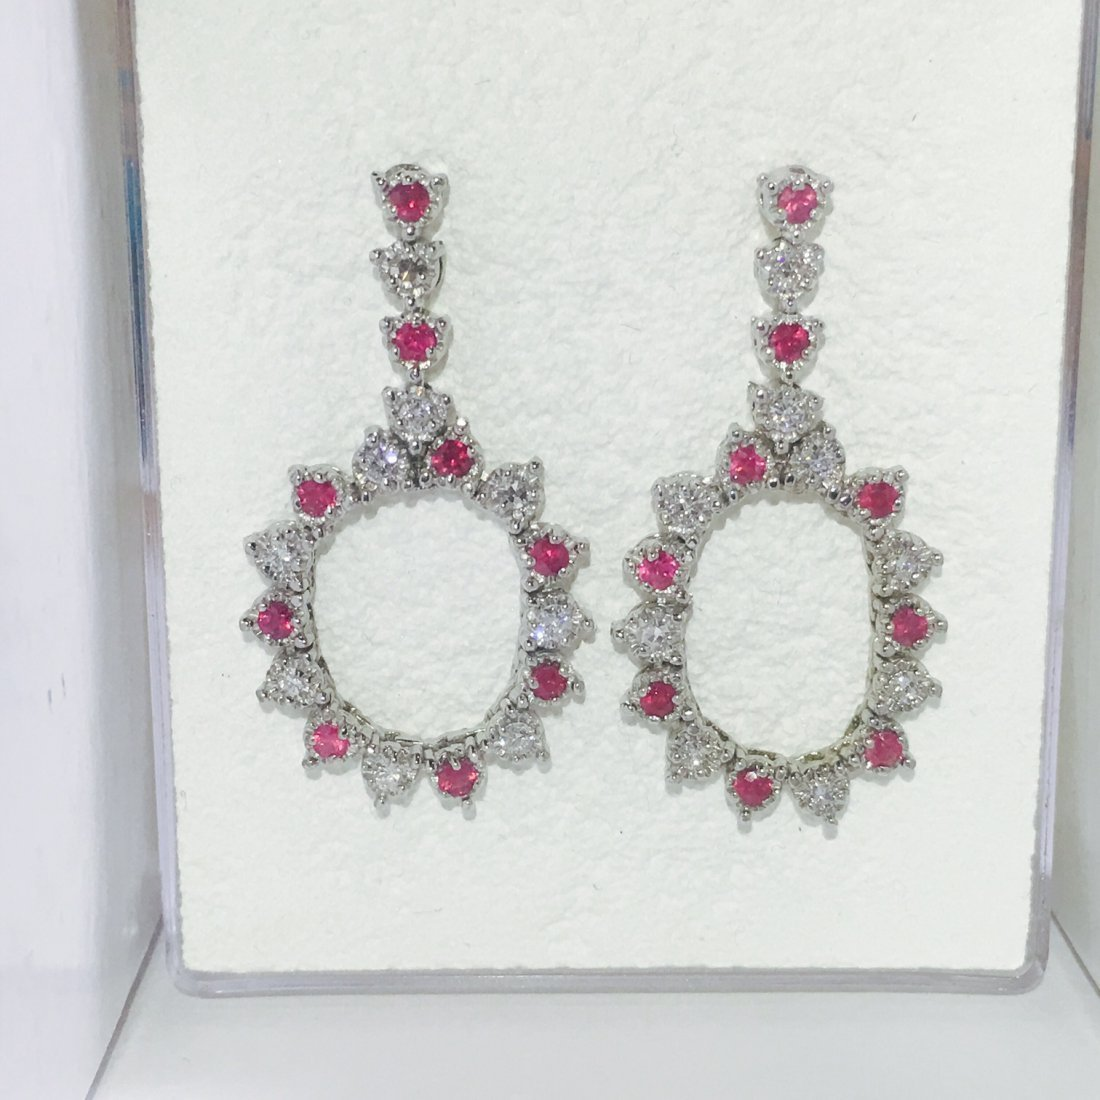 14K Gold, Super Gem Burma Ruby and VS Diamond Earrings